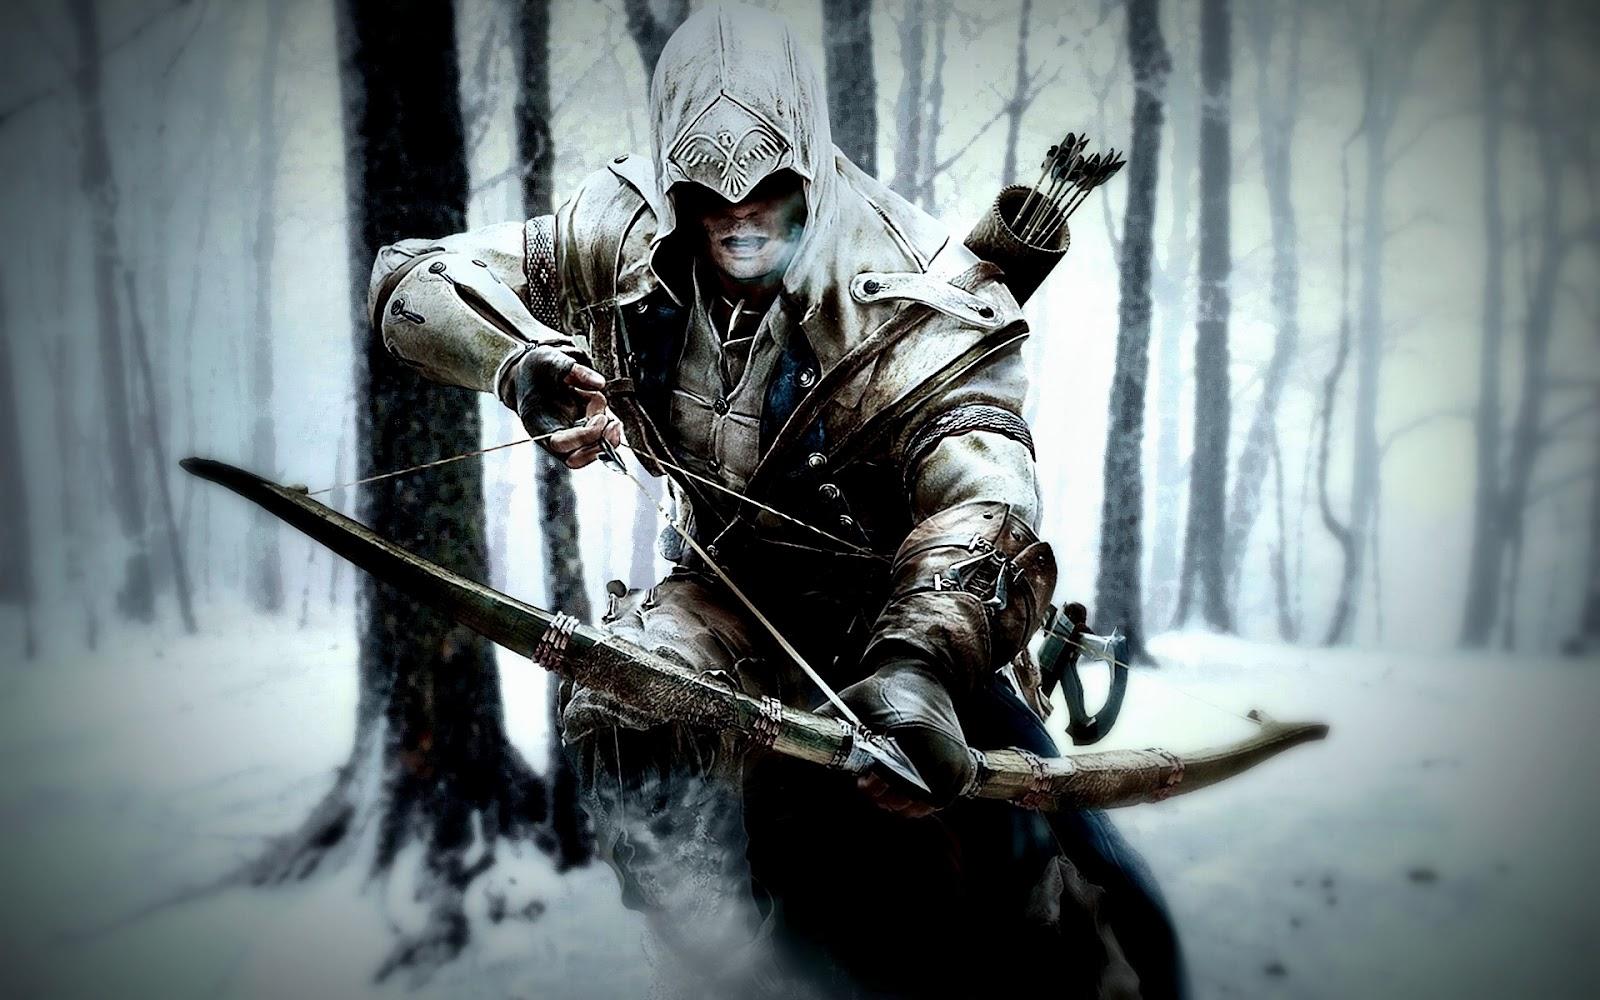 pic new posts: Hd Wallpaper Assassins Creed 3